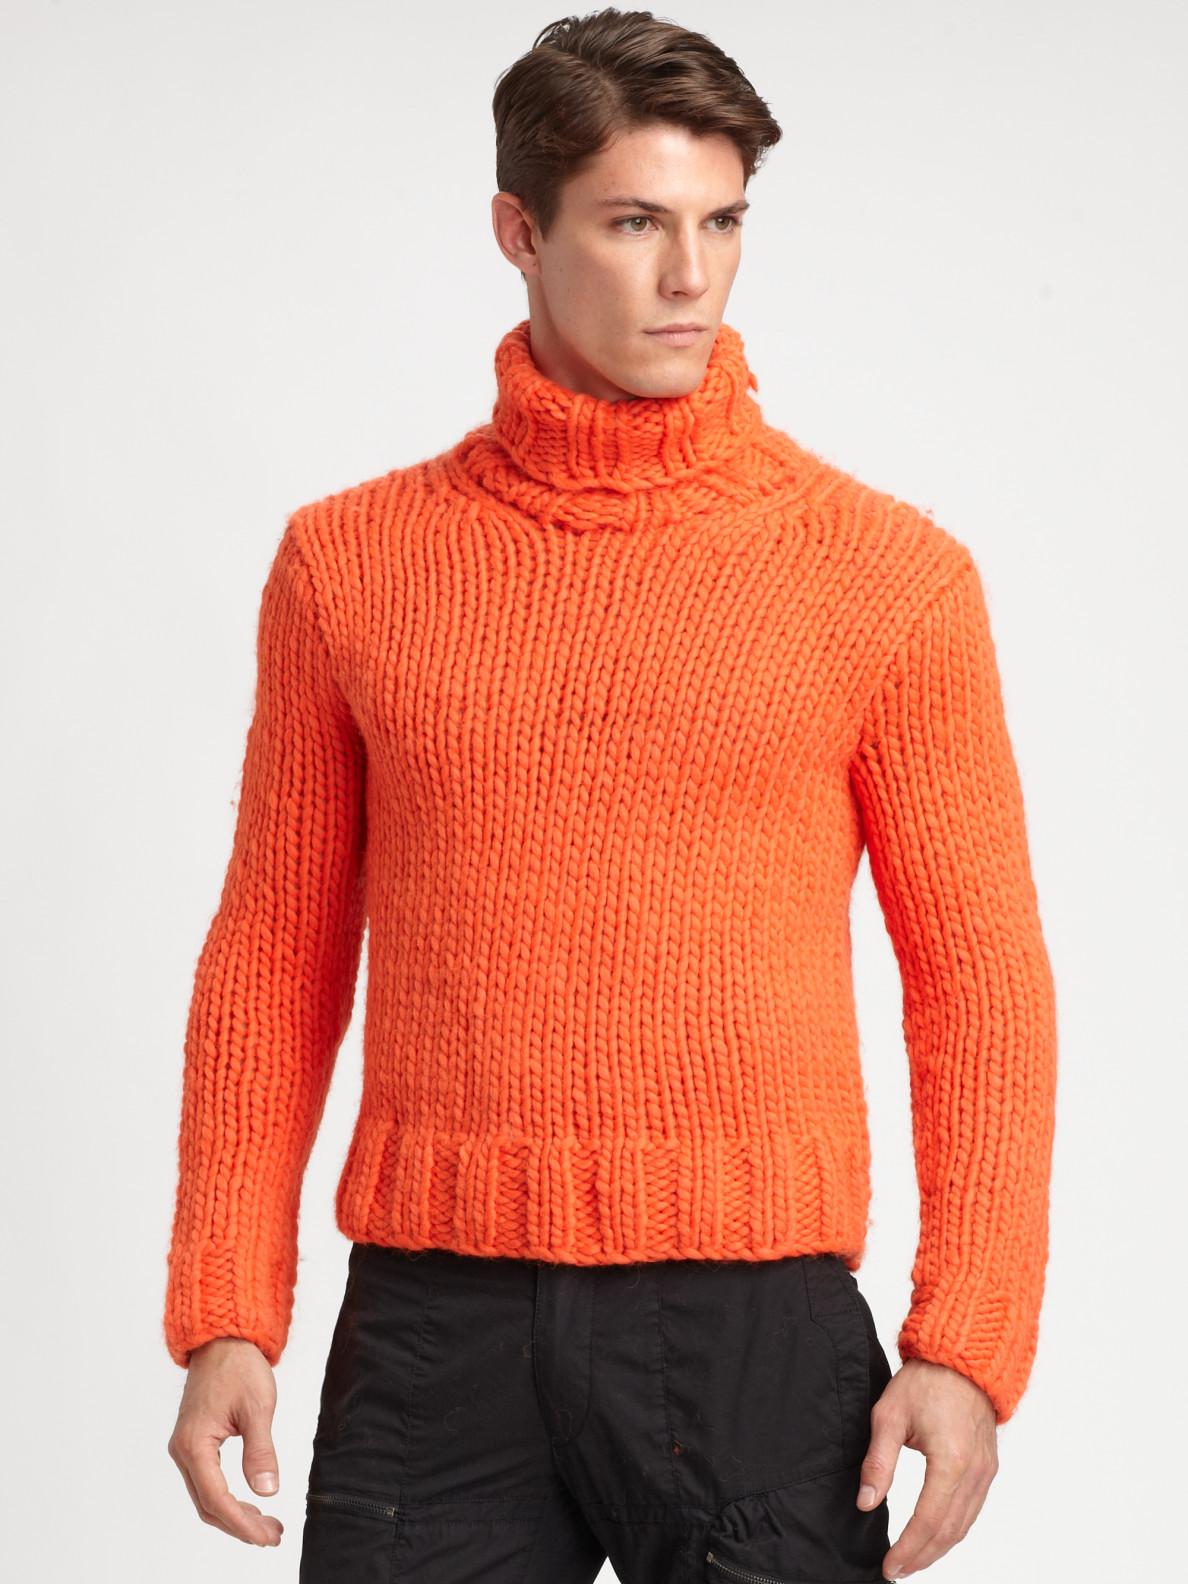 Mens Wool Turtleneck Sweater